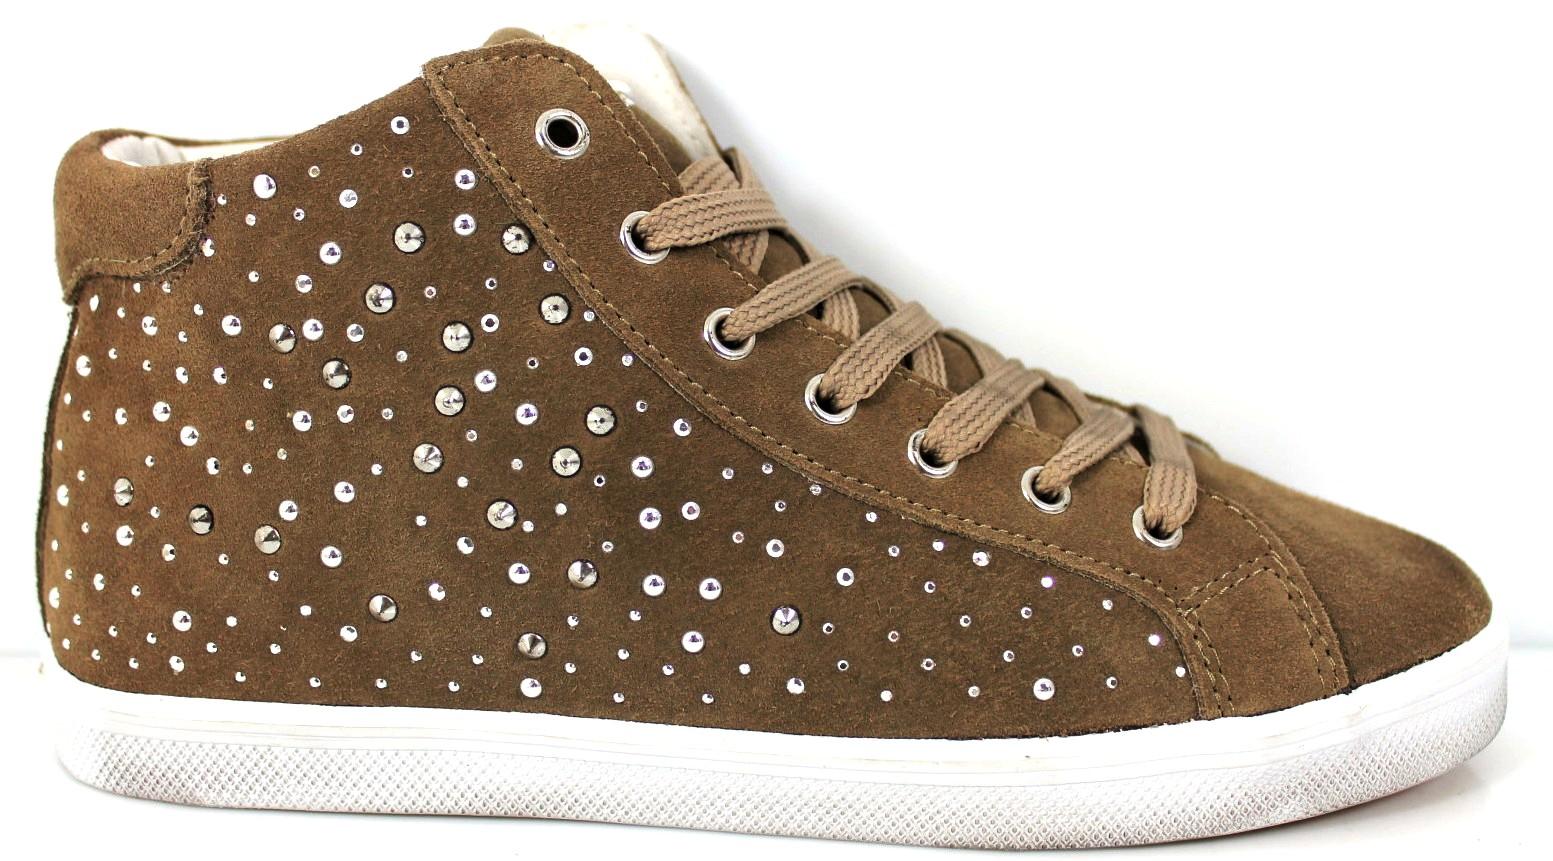 Polacchine Camoscio Liu Jo UM20773 Scarpe Donna Bambina Calzature Woman  Shoes 73be05be4f8